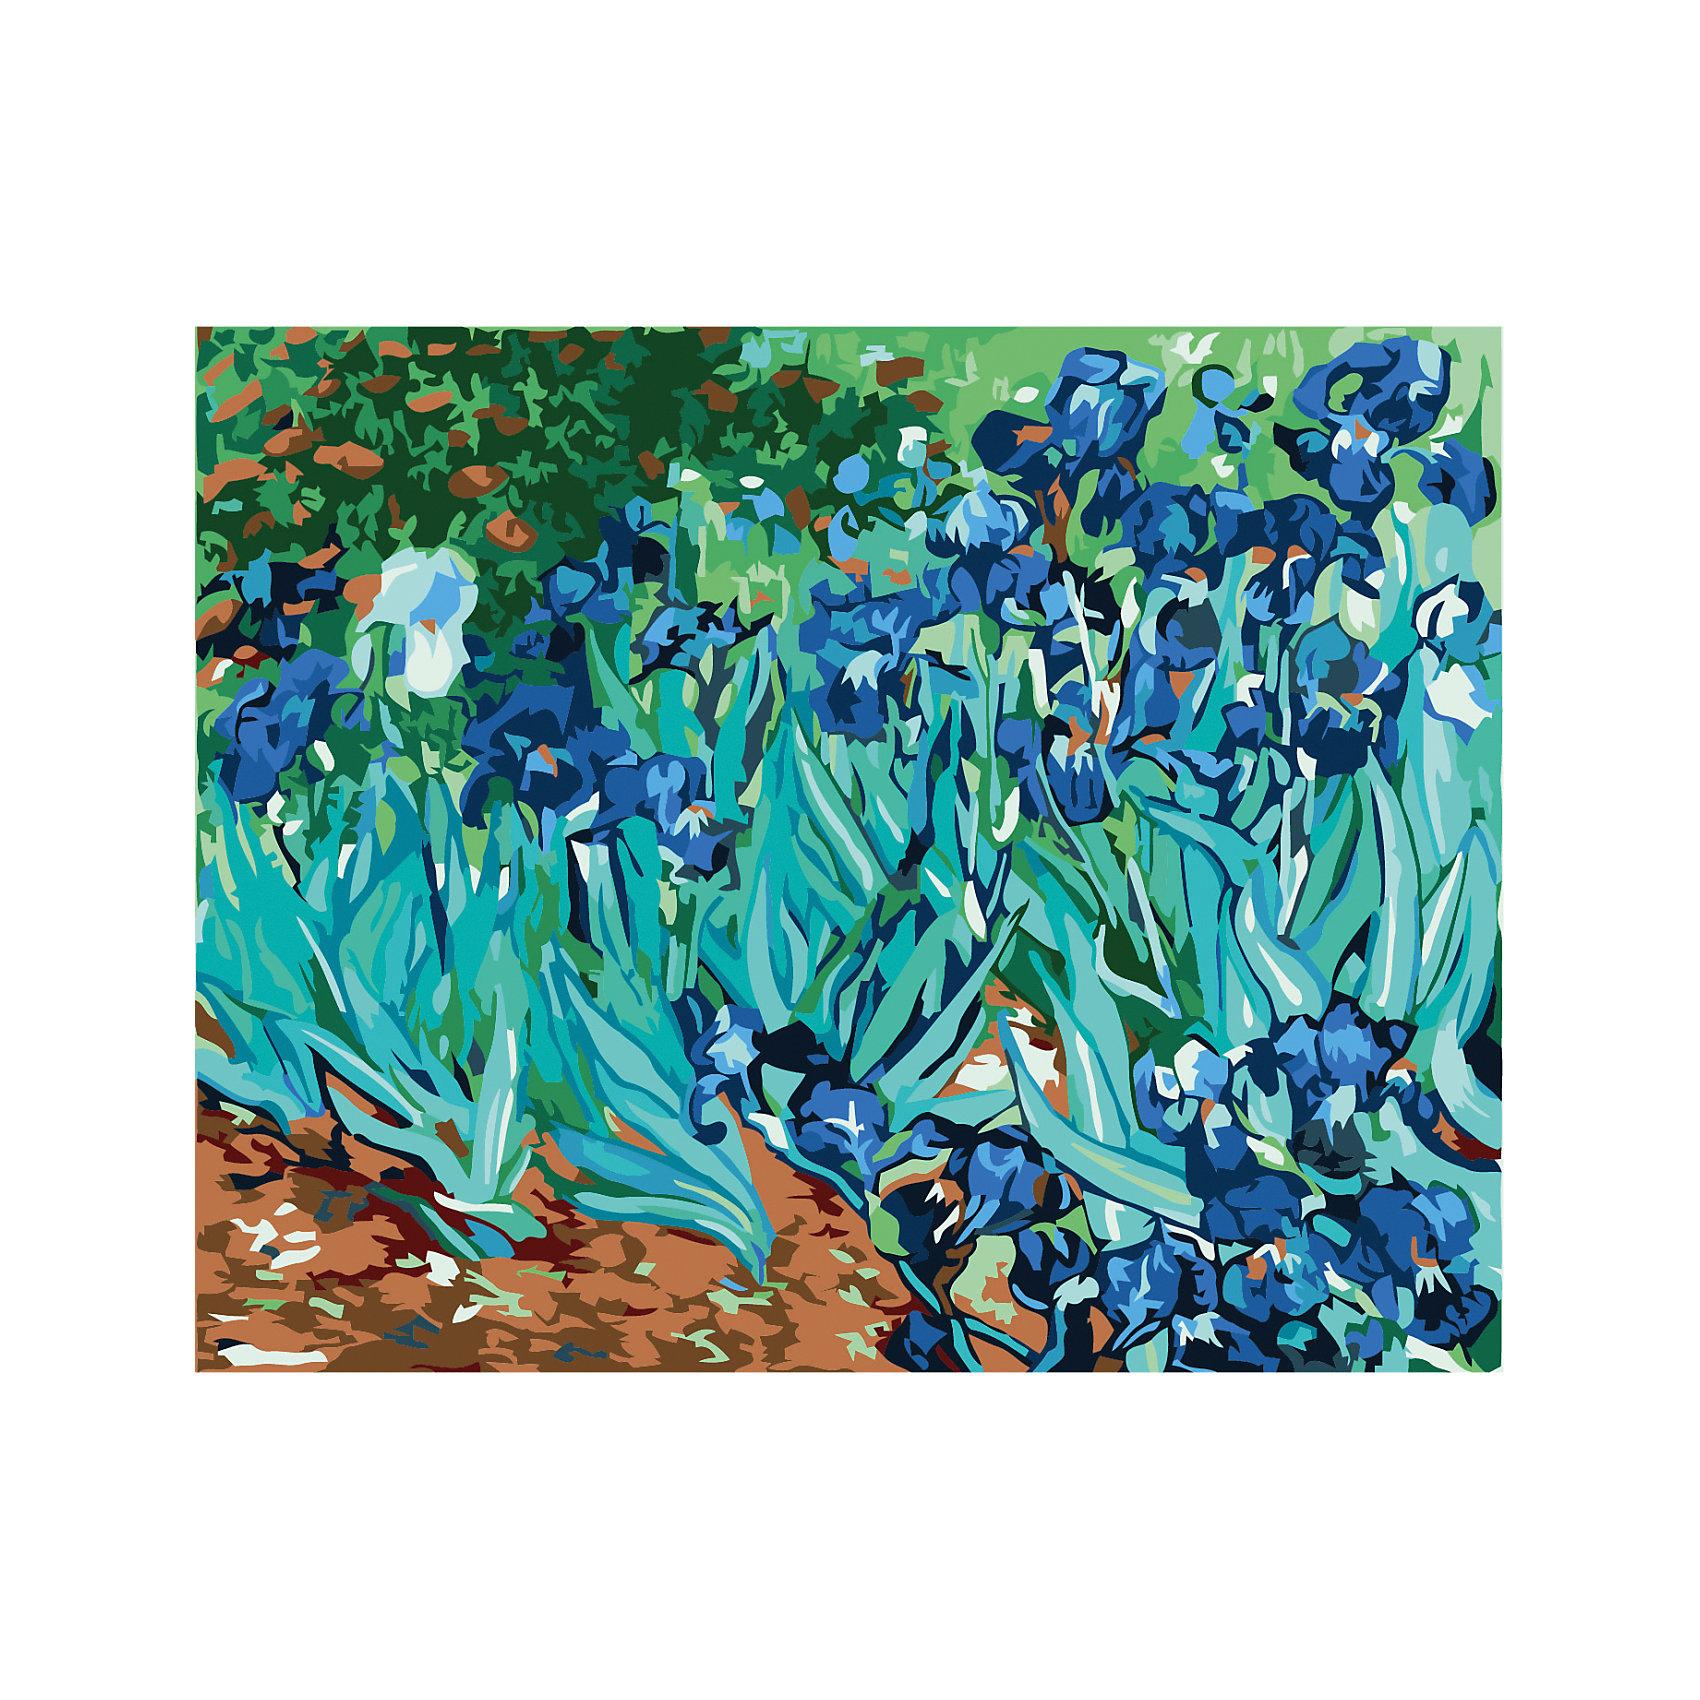 Роспись по номерам Ирисы Ван Гог (синие цветы), 40*50 см<br><br>Ширина мм: 420<br>Глубина мм: 520<br>Высота мм: 25<br>Вес г: 500<br>Возраст от месяцев: 36<br>Возраст до месяцев: 2147483647<br>Пол: Унисекс<br>Возраст: Детский<br>SKU: 5579744